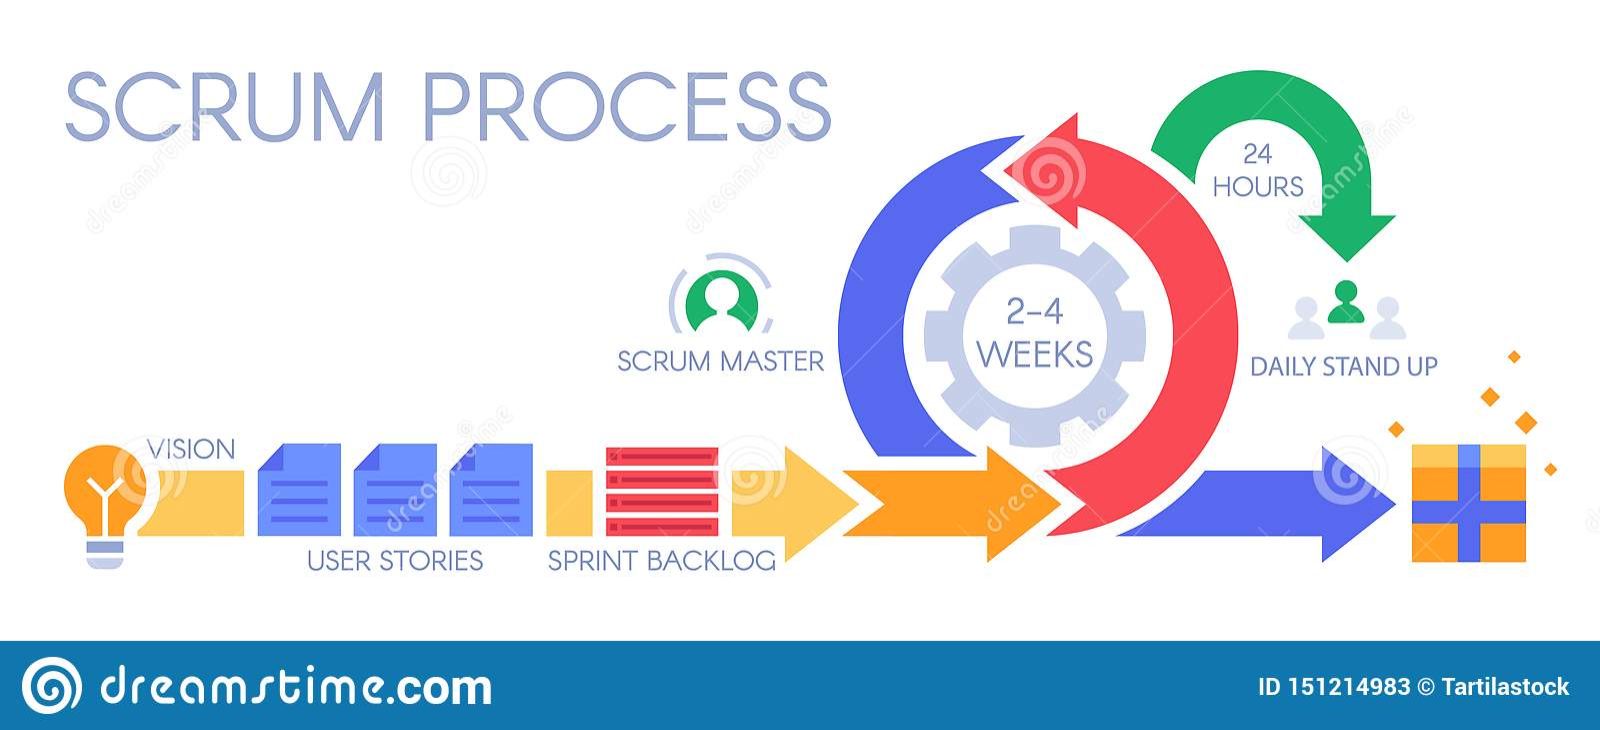 Agile Management scrum process infographic. agile development methodology